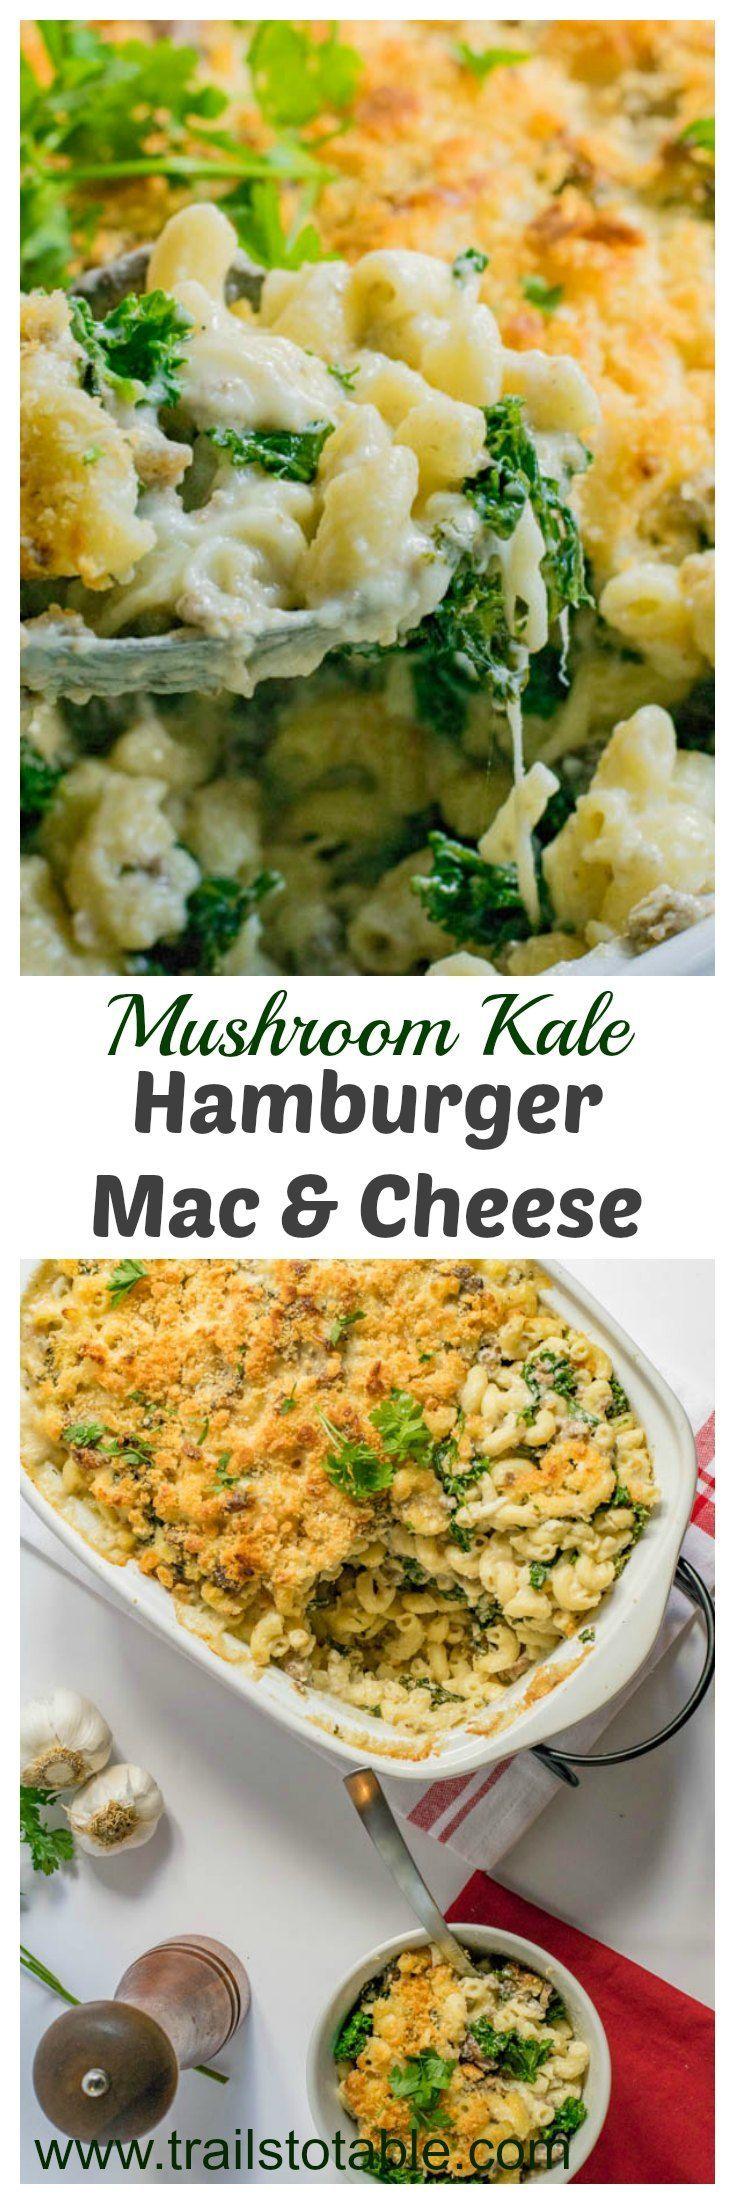 Mushroom Kale Hamburger Macaroni and Cheese. Sauteed mushrooms, kale, and hamburger combines to make the best baked macaroni and cheese ever!